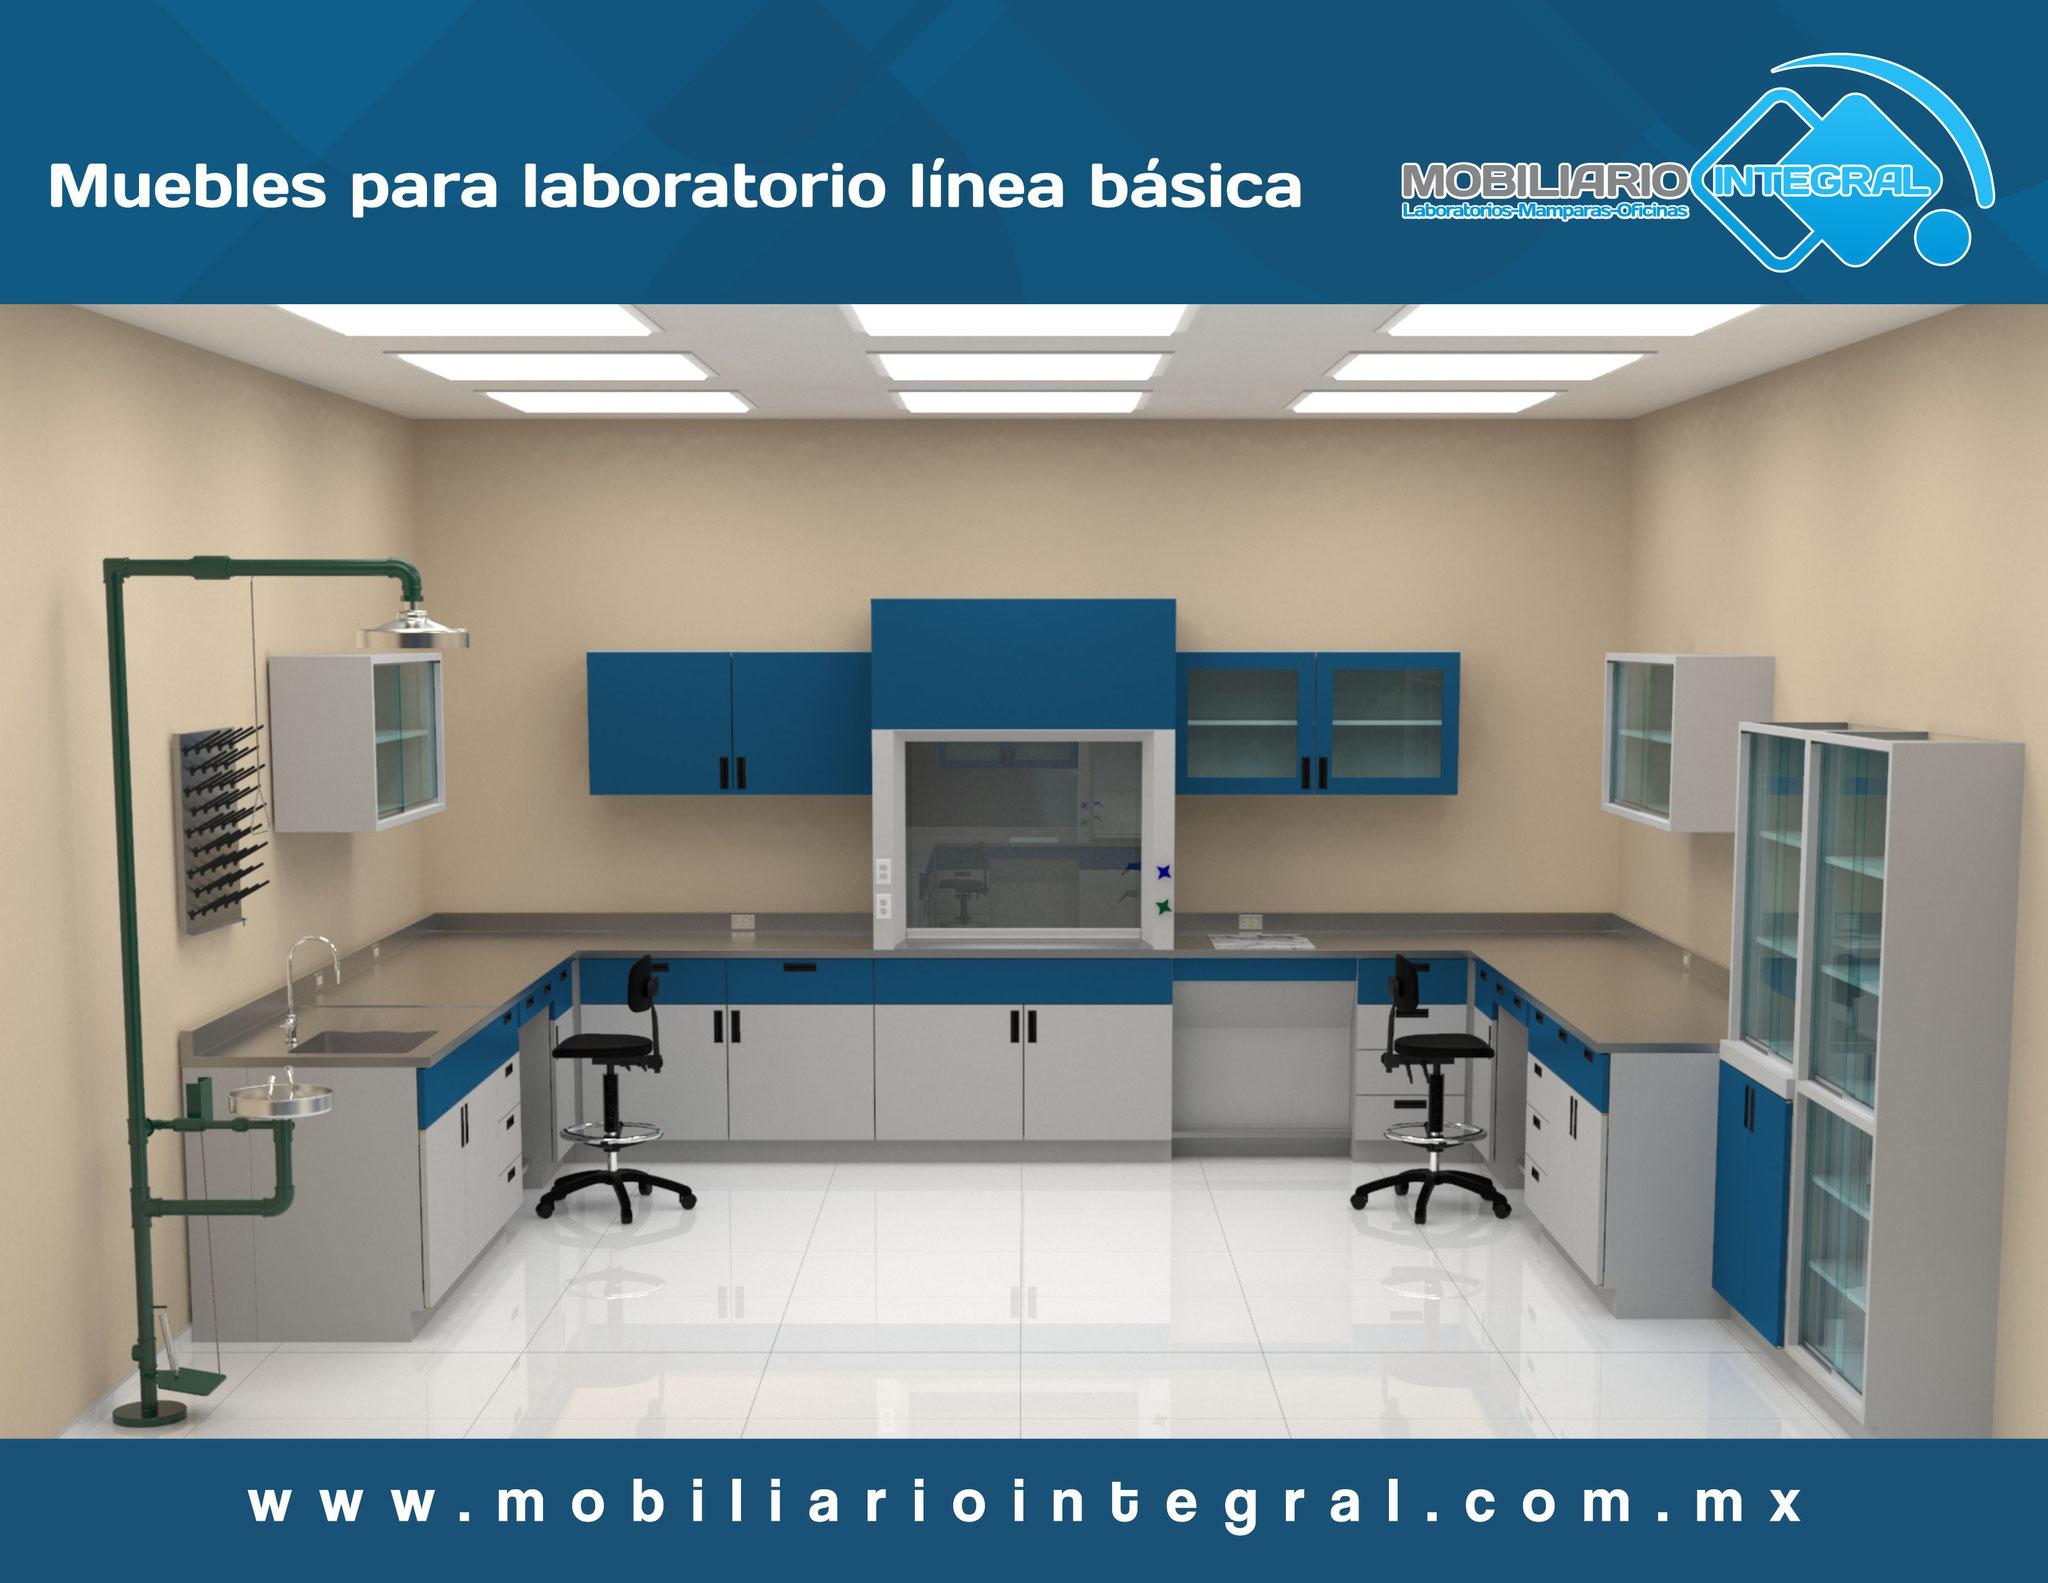 Muebles para laboratorio en Nezahualcóyotl